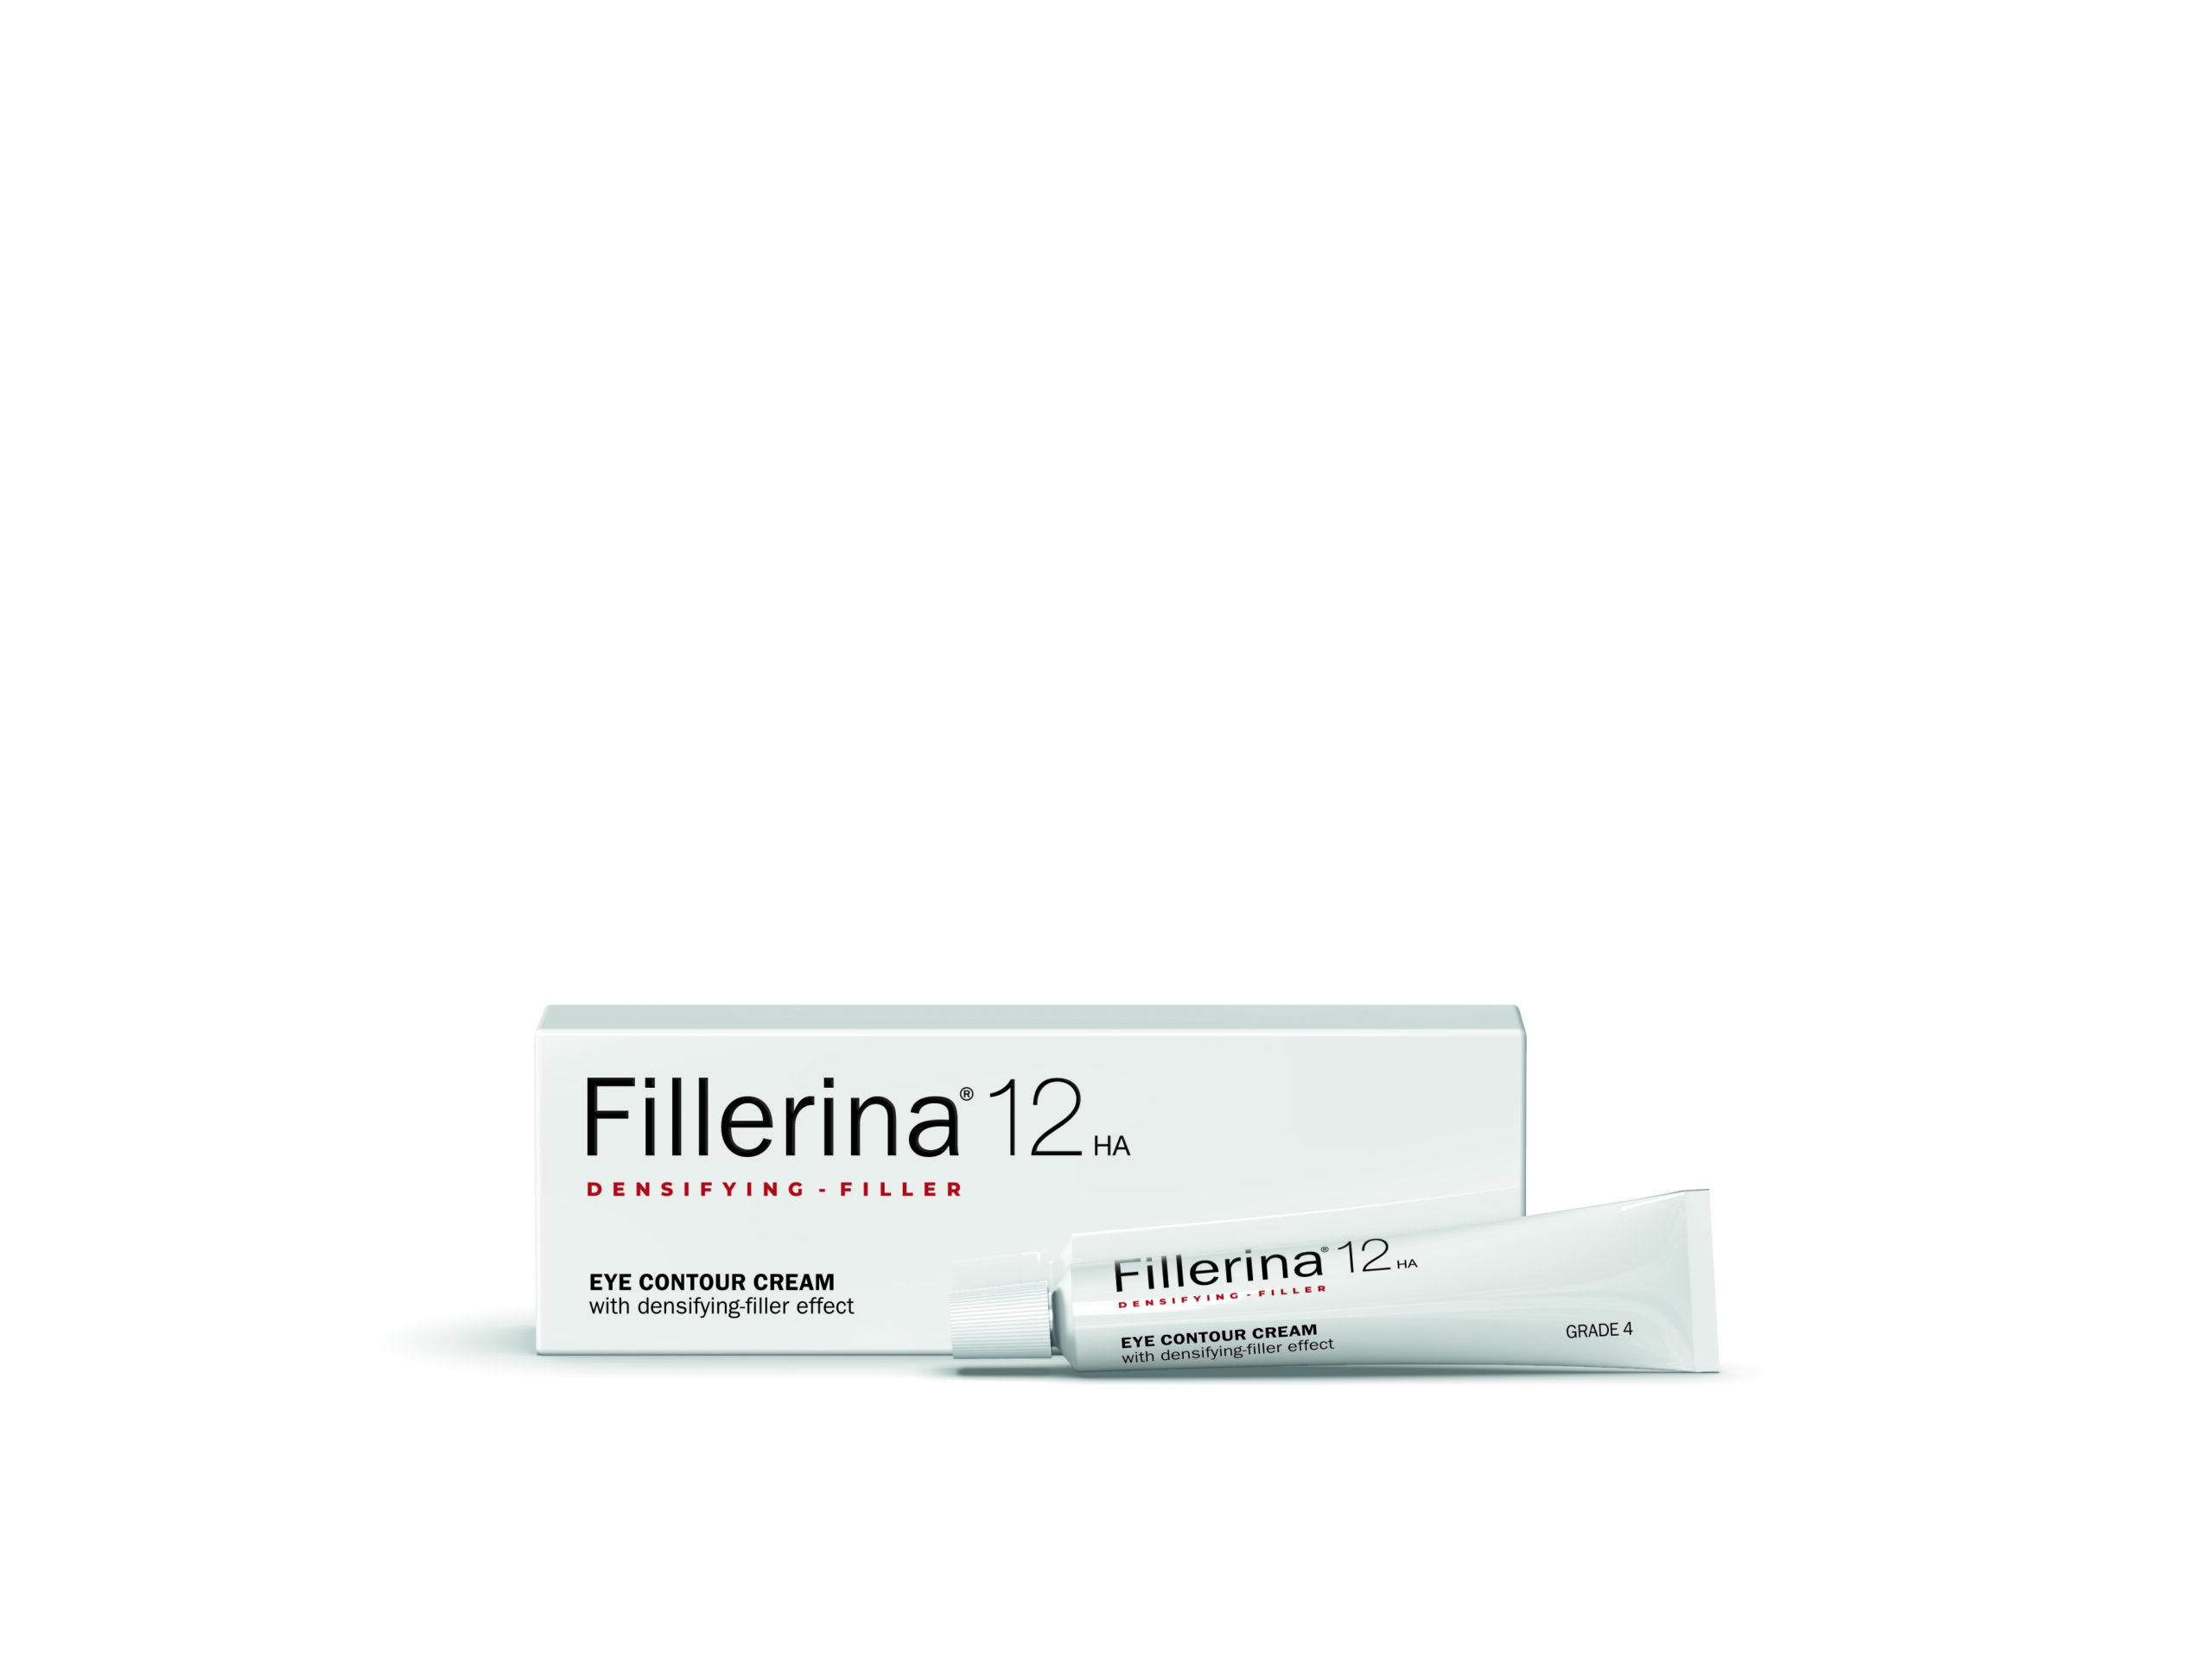 Fillerina 12 HA skin fillers